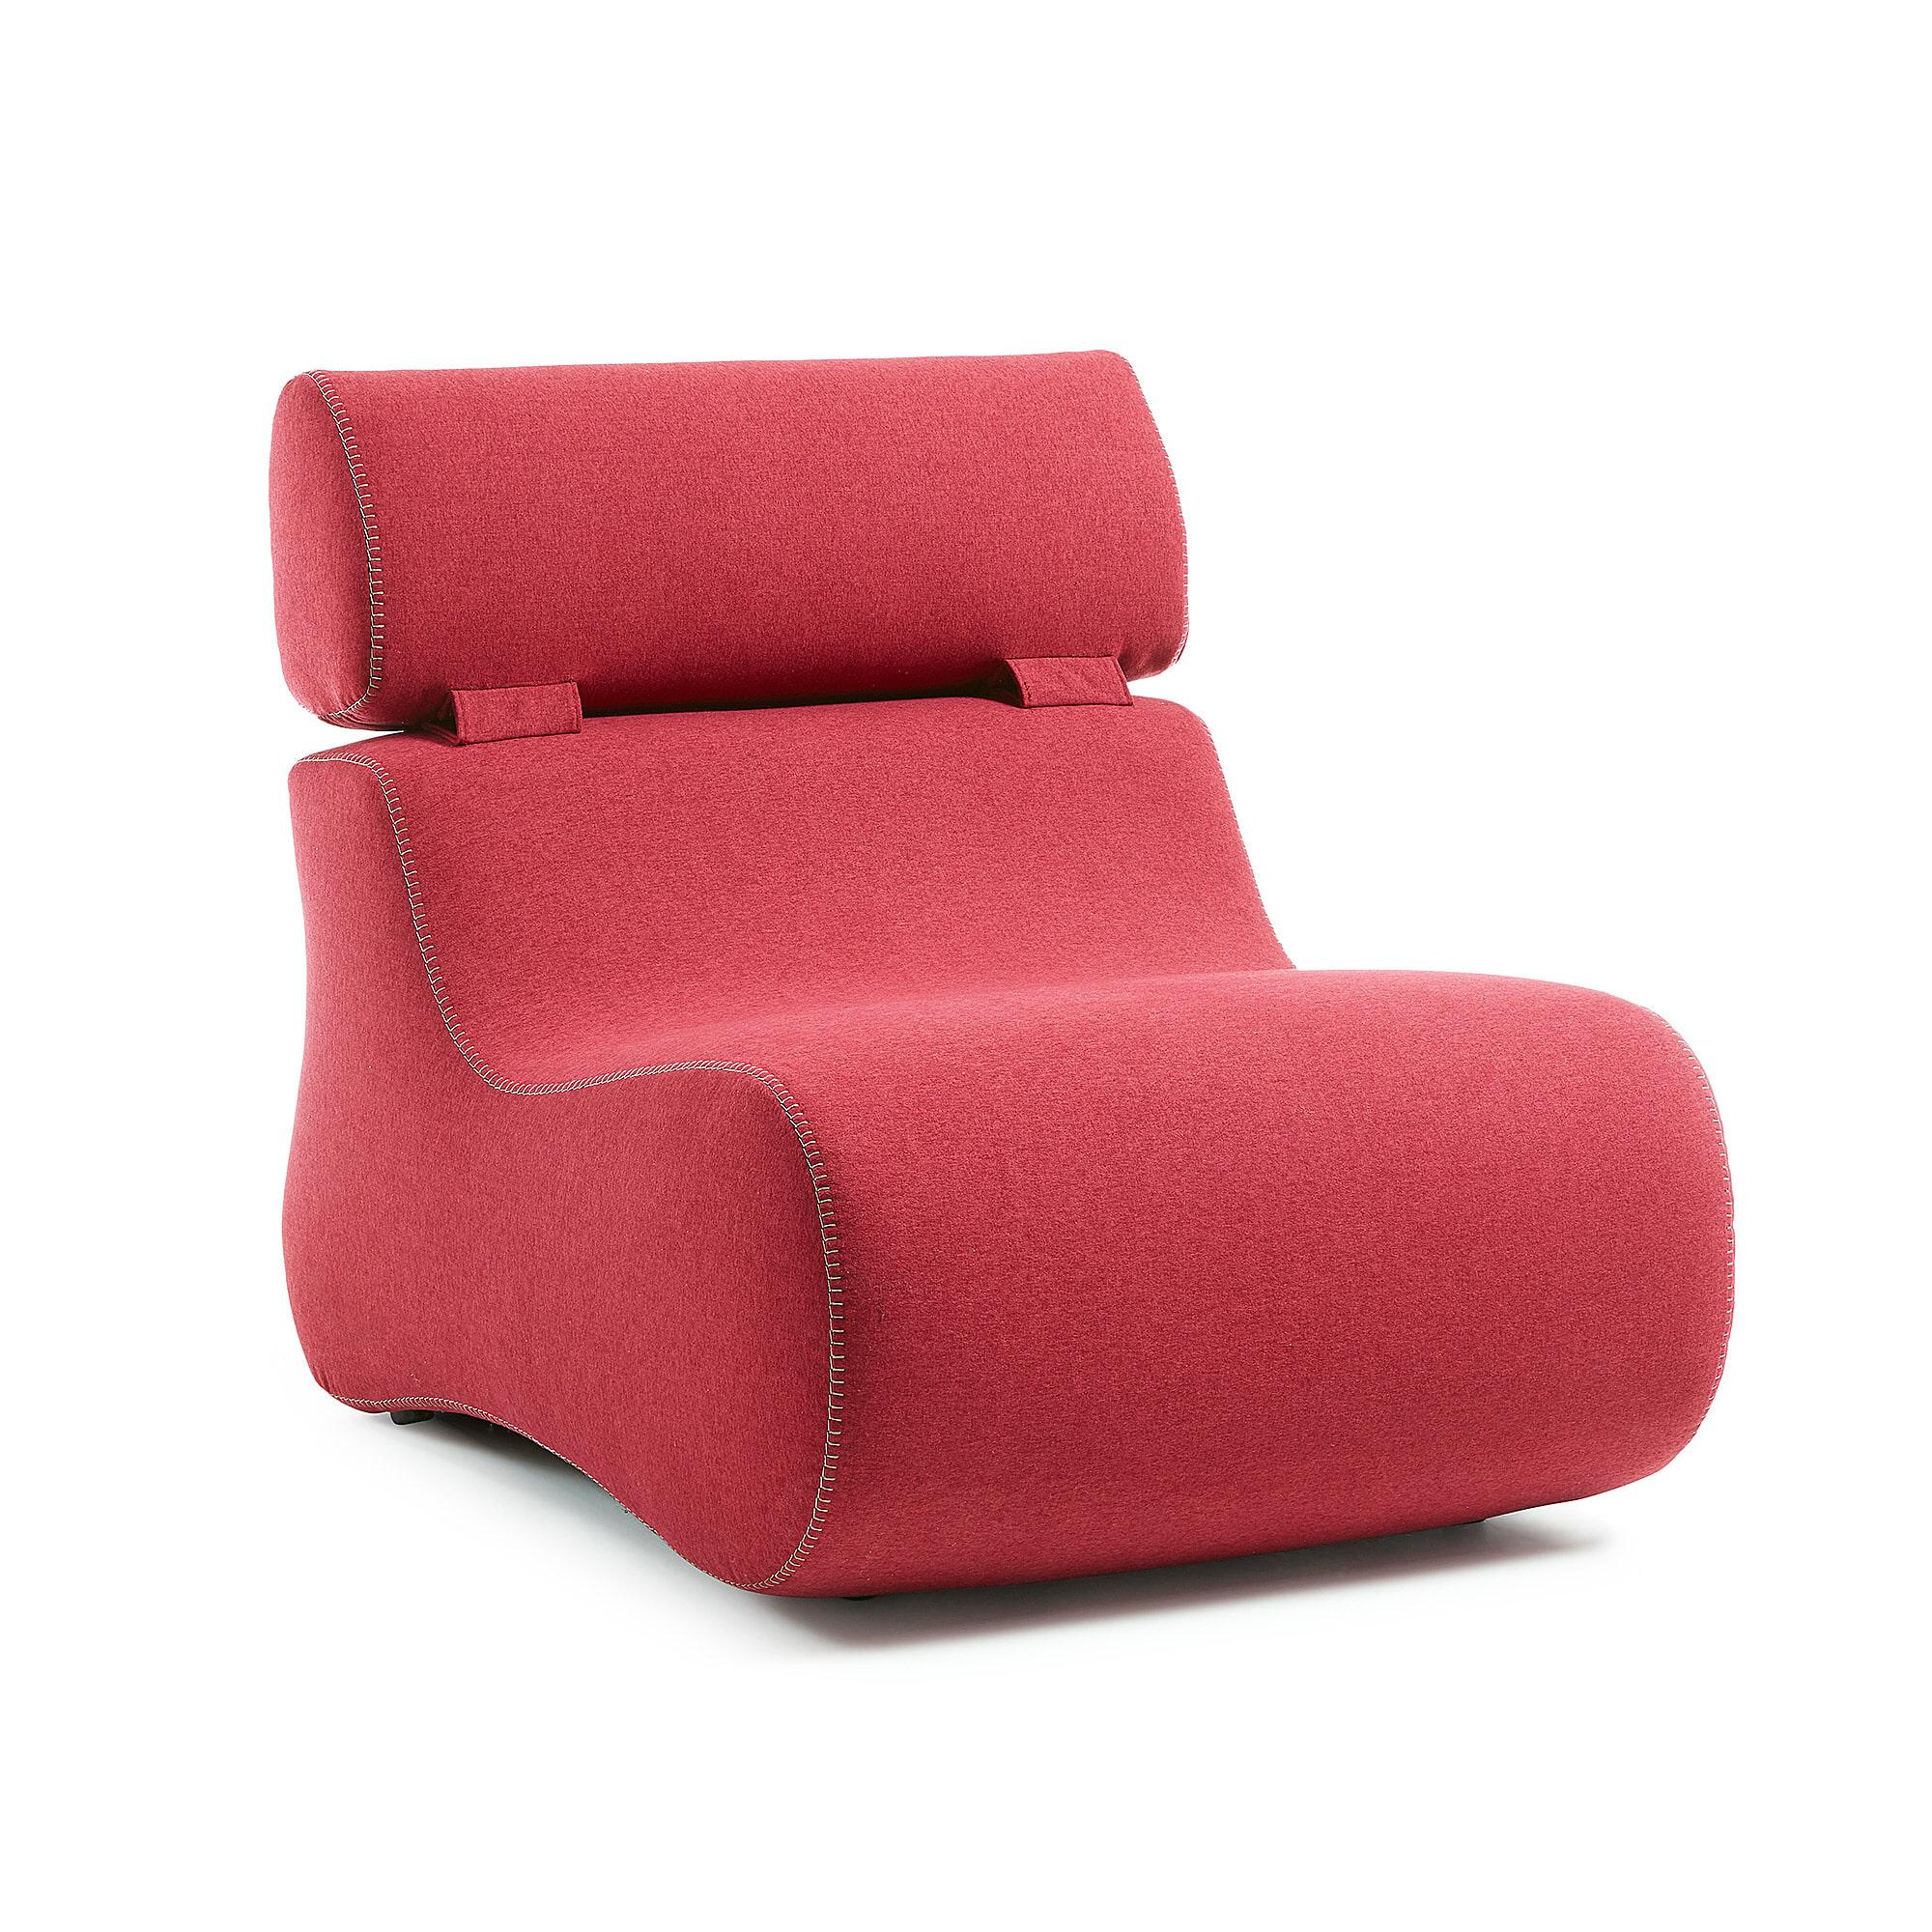 Kave Home Fauteuil 'Club' kleur rood